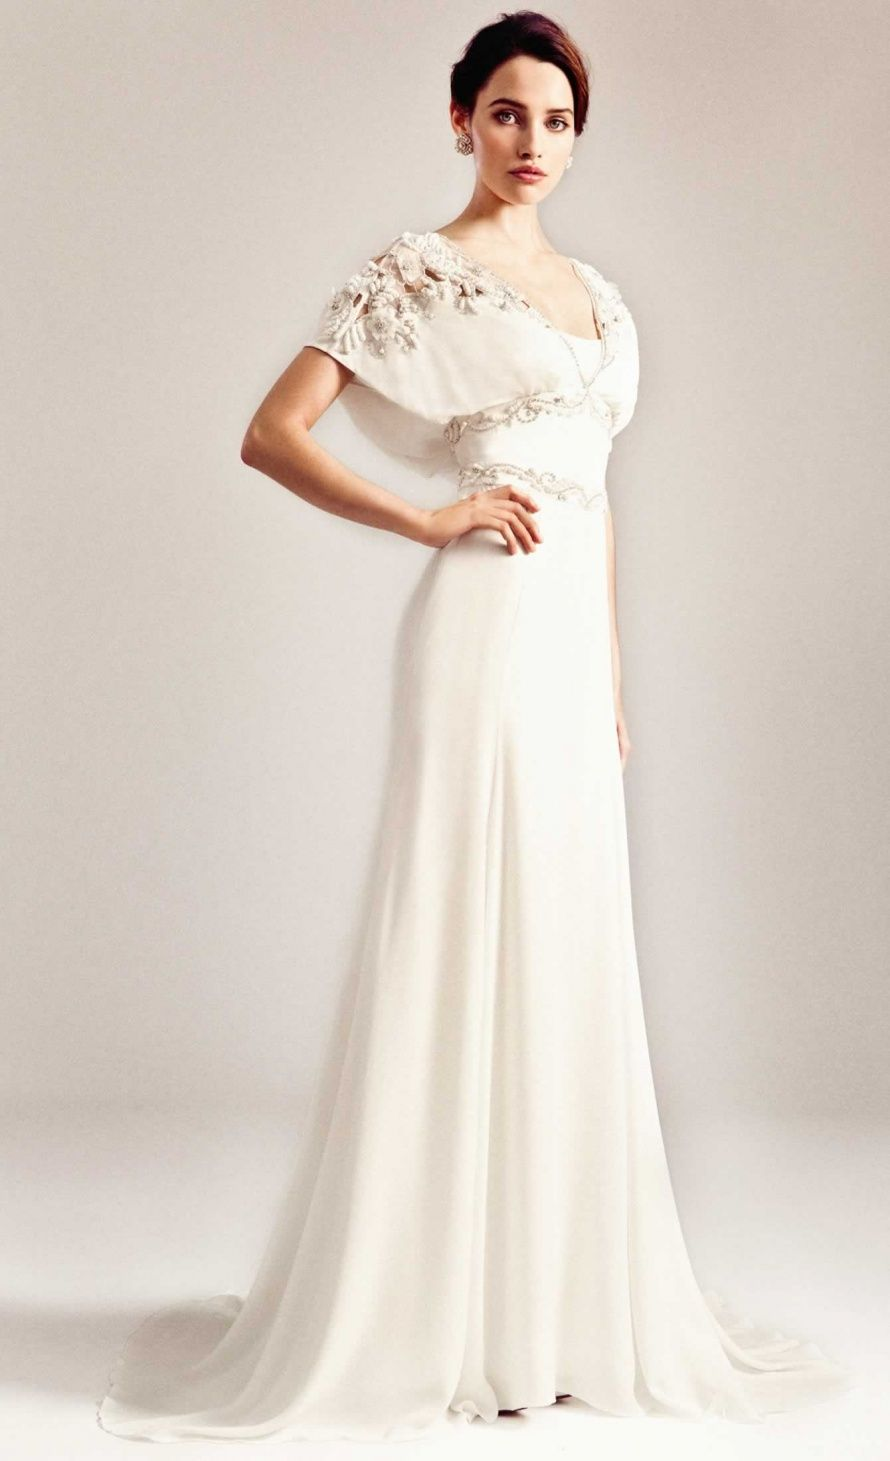 15Y RTW Look 6  Willow Dress   Temperley London   ~ Wedding Gown pt2 ...